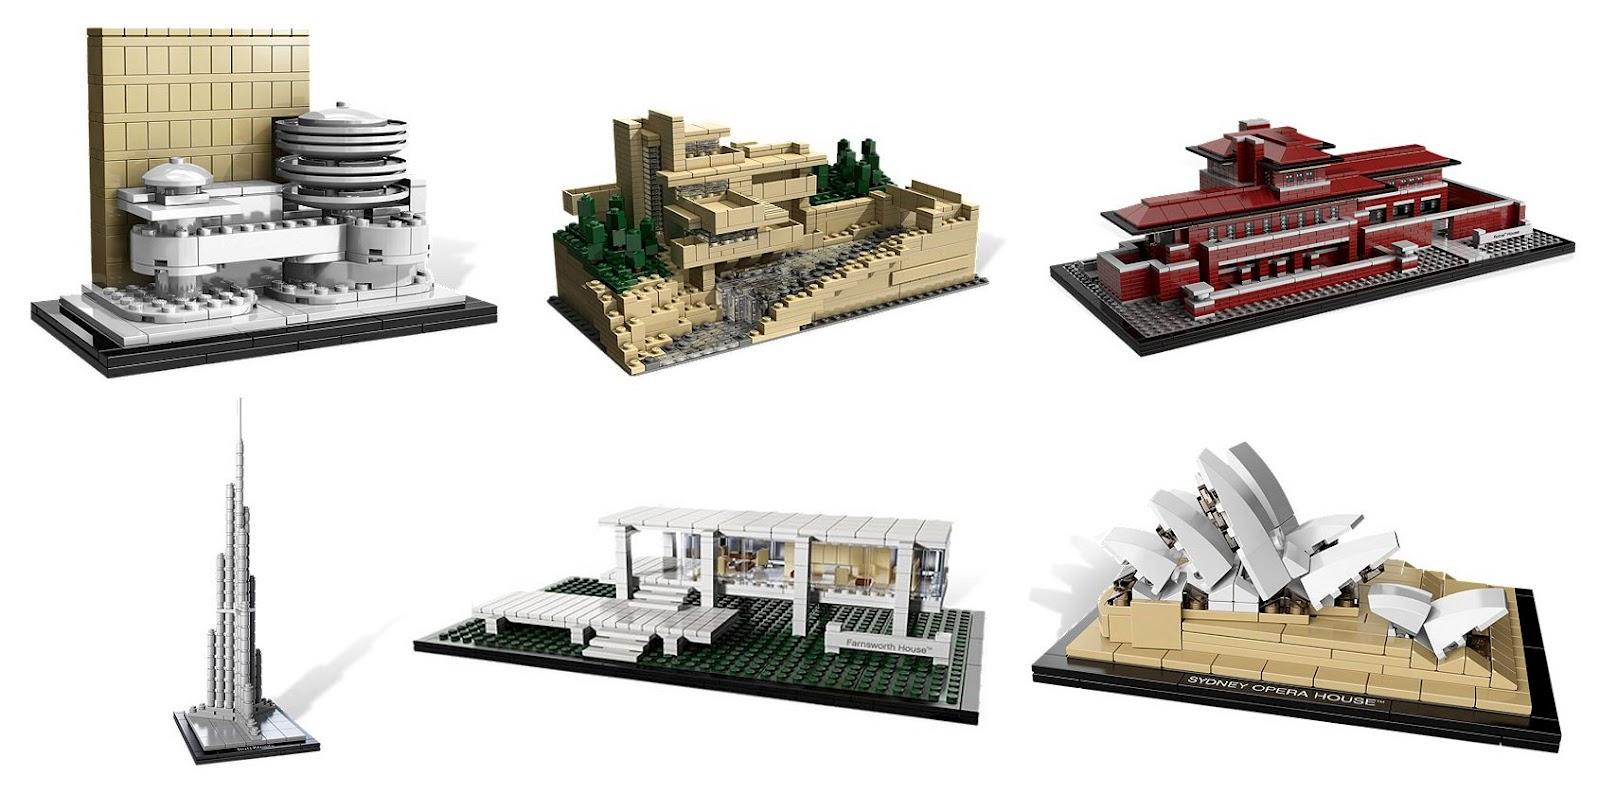 lego architecture architect series sydney human landmark opera